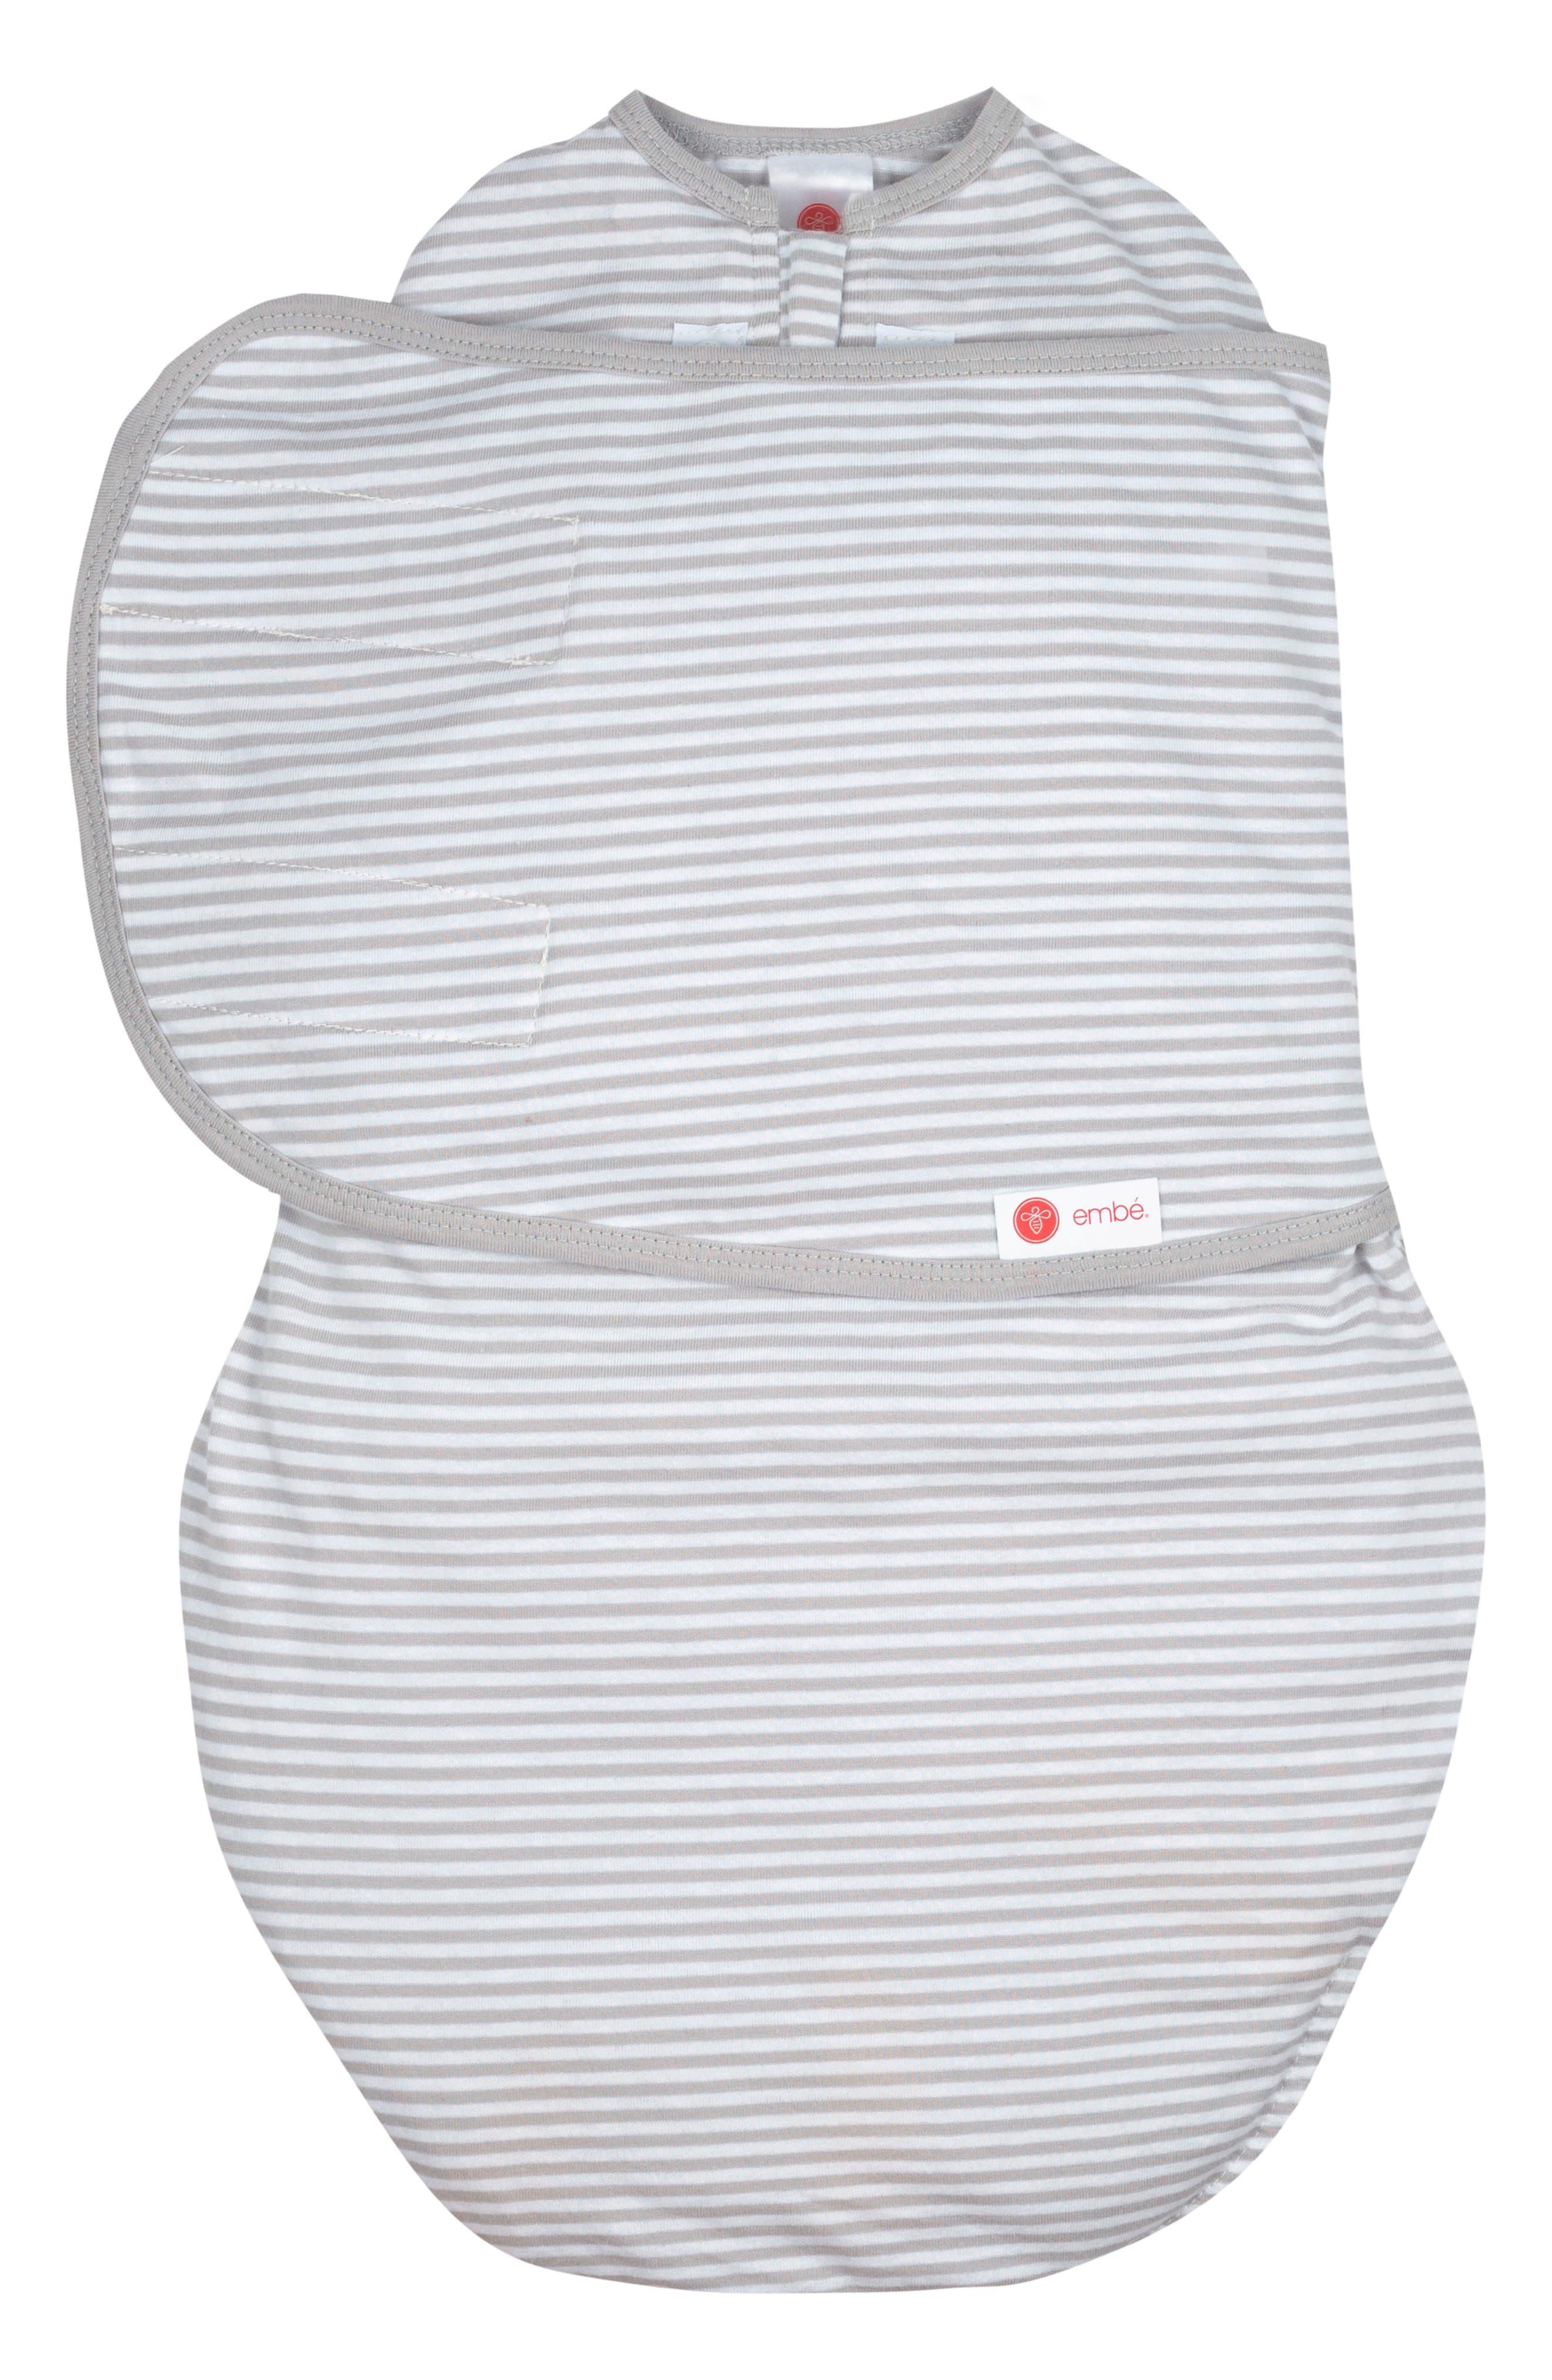 2-Way Swaddle,                             Main thumbnail 1, color,                             Grey Stripe